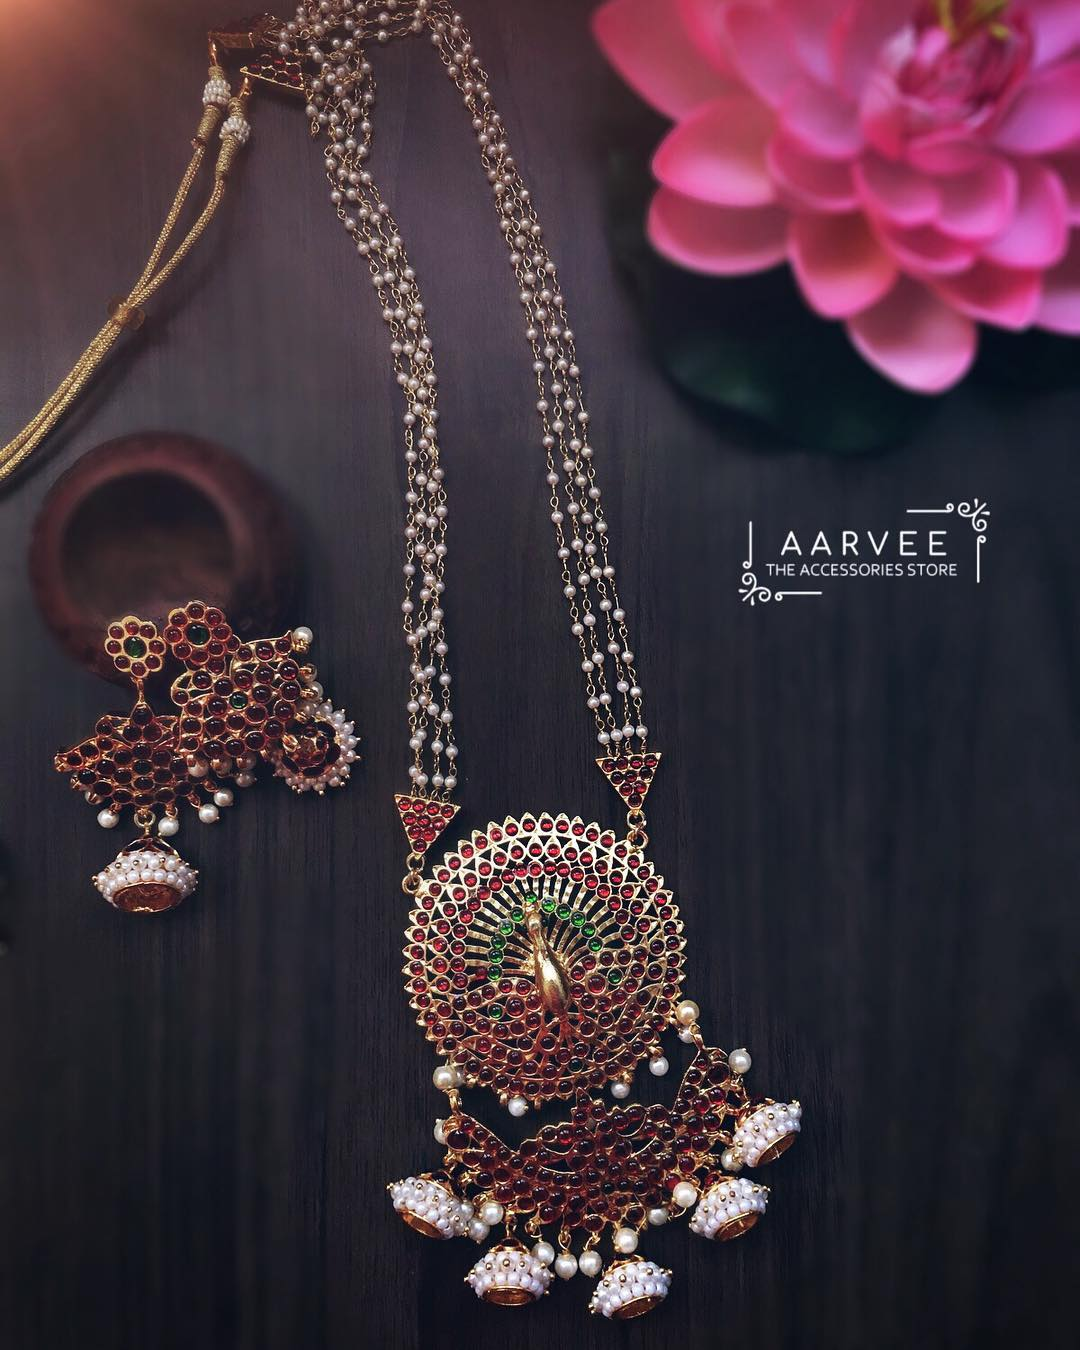 kemp-jewellery-designs-2019 (1)